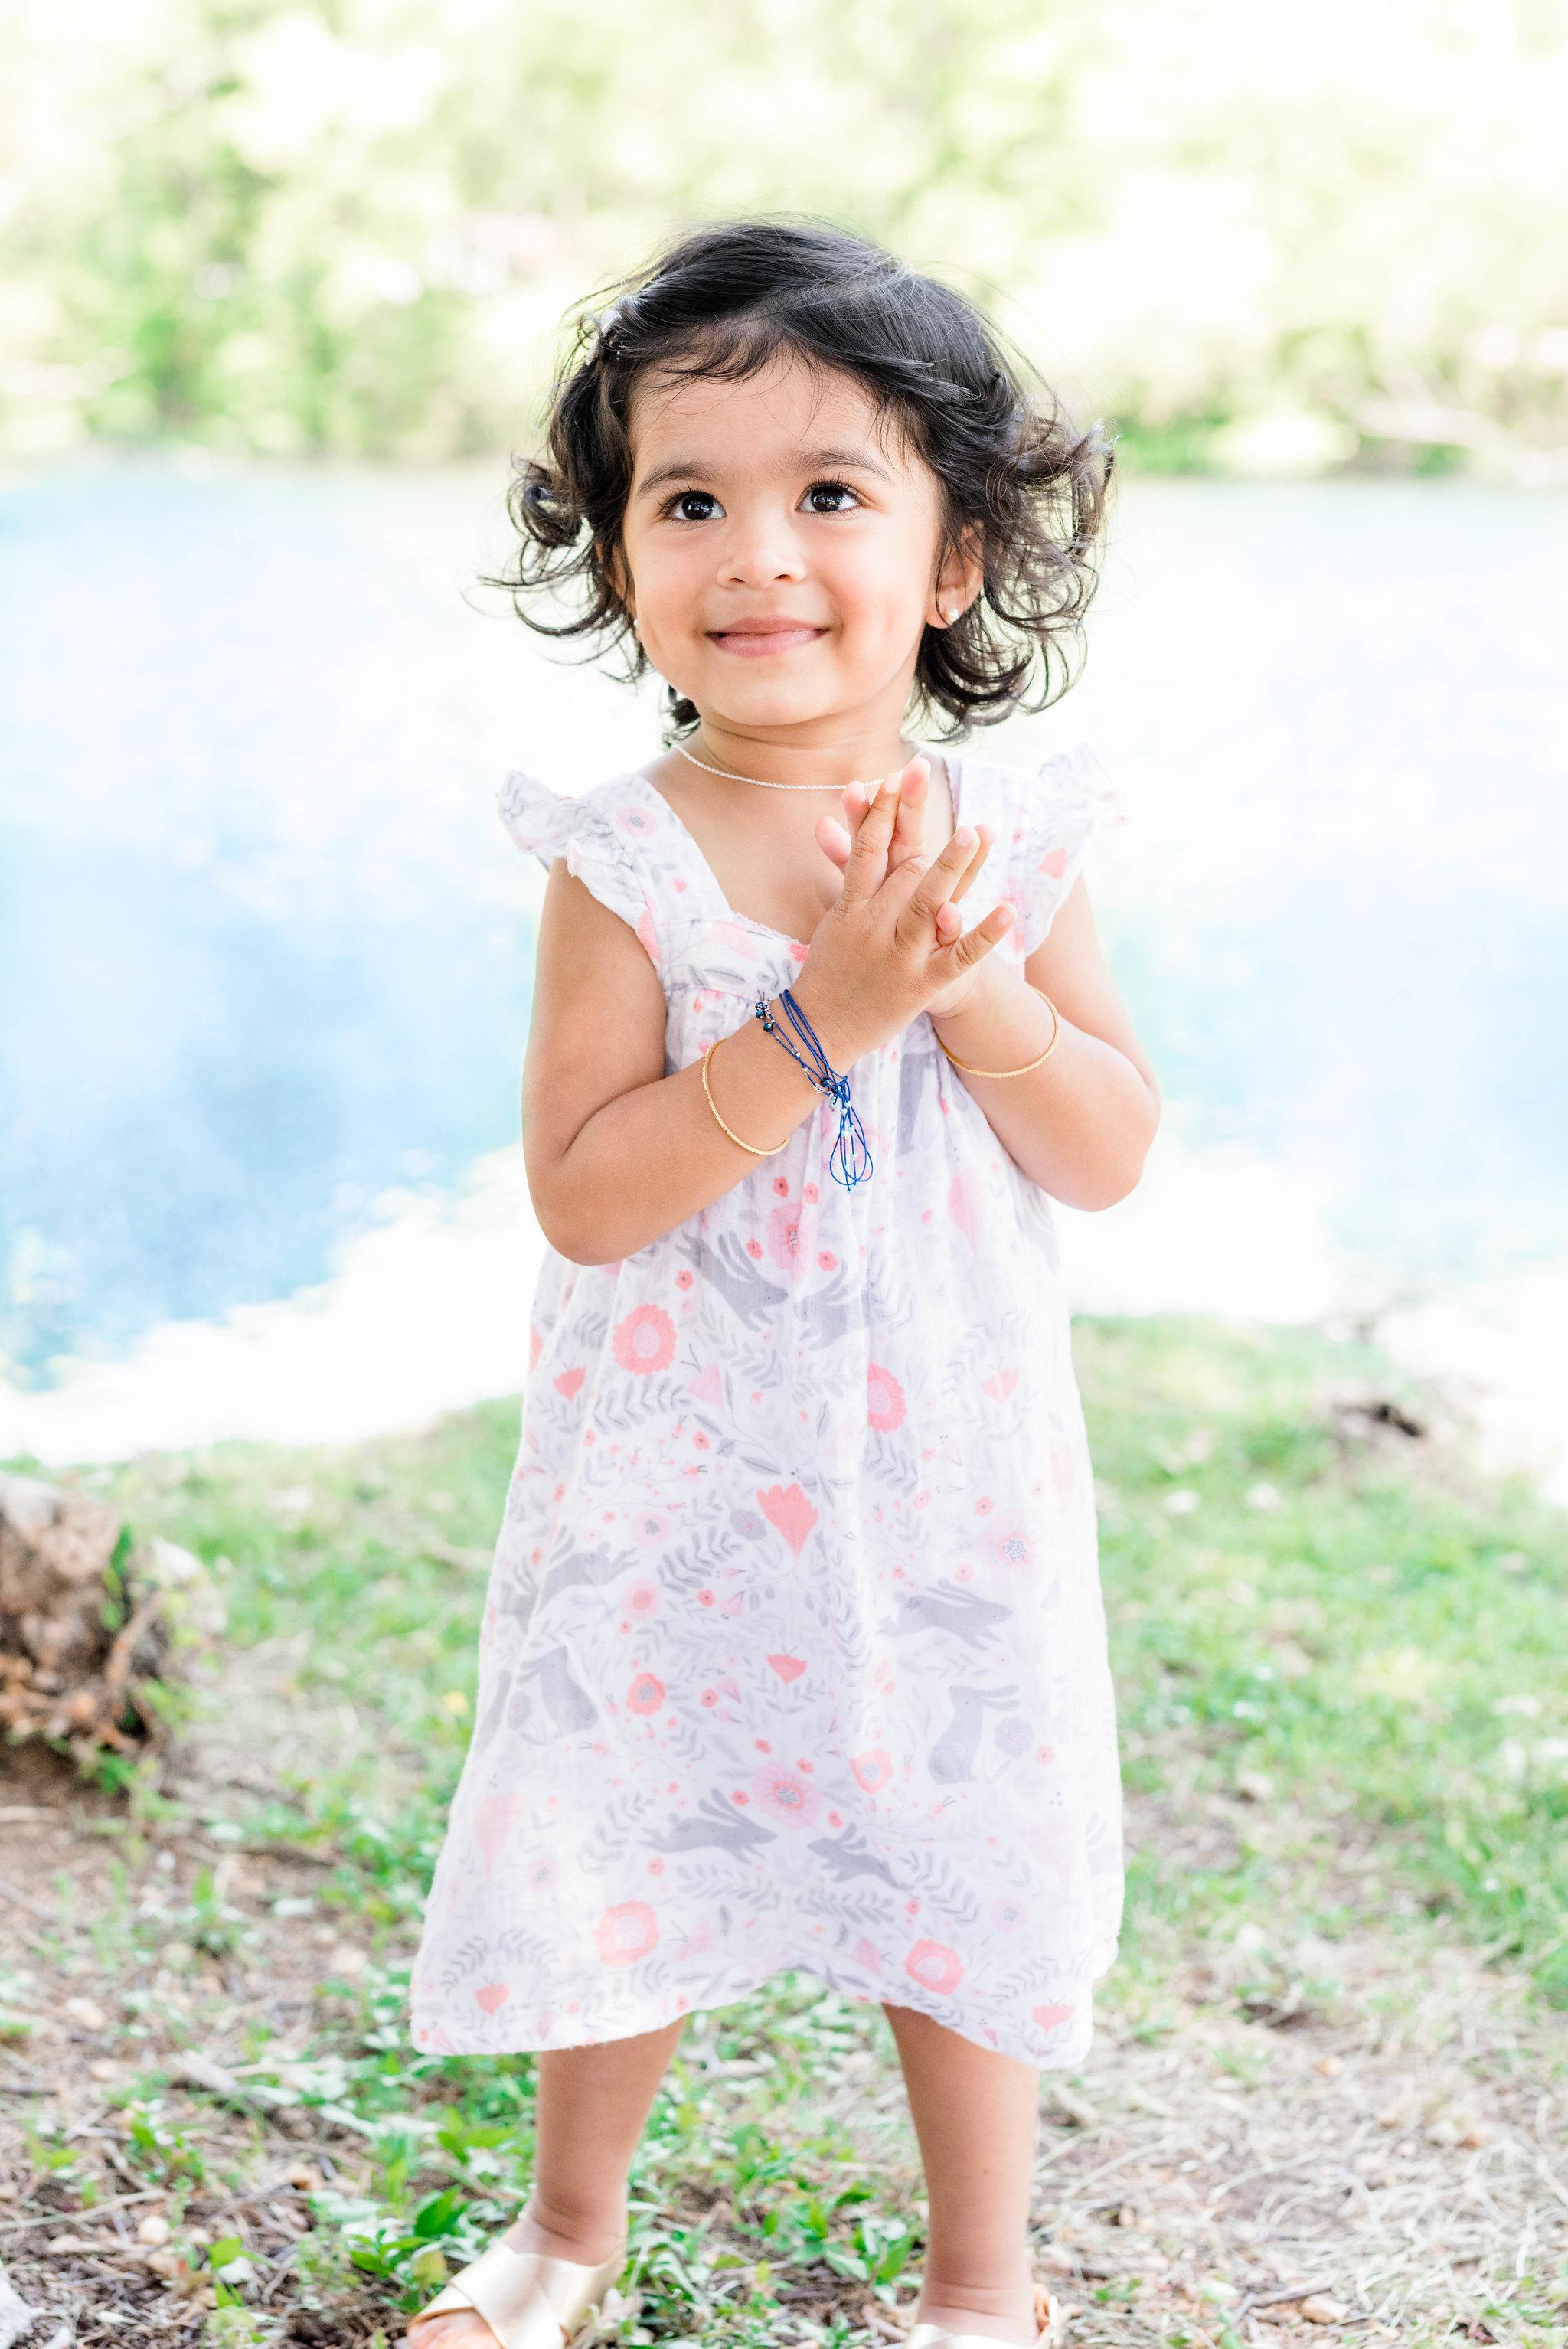 Oahu Child Photographers | Toddler Girl Portrait Session